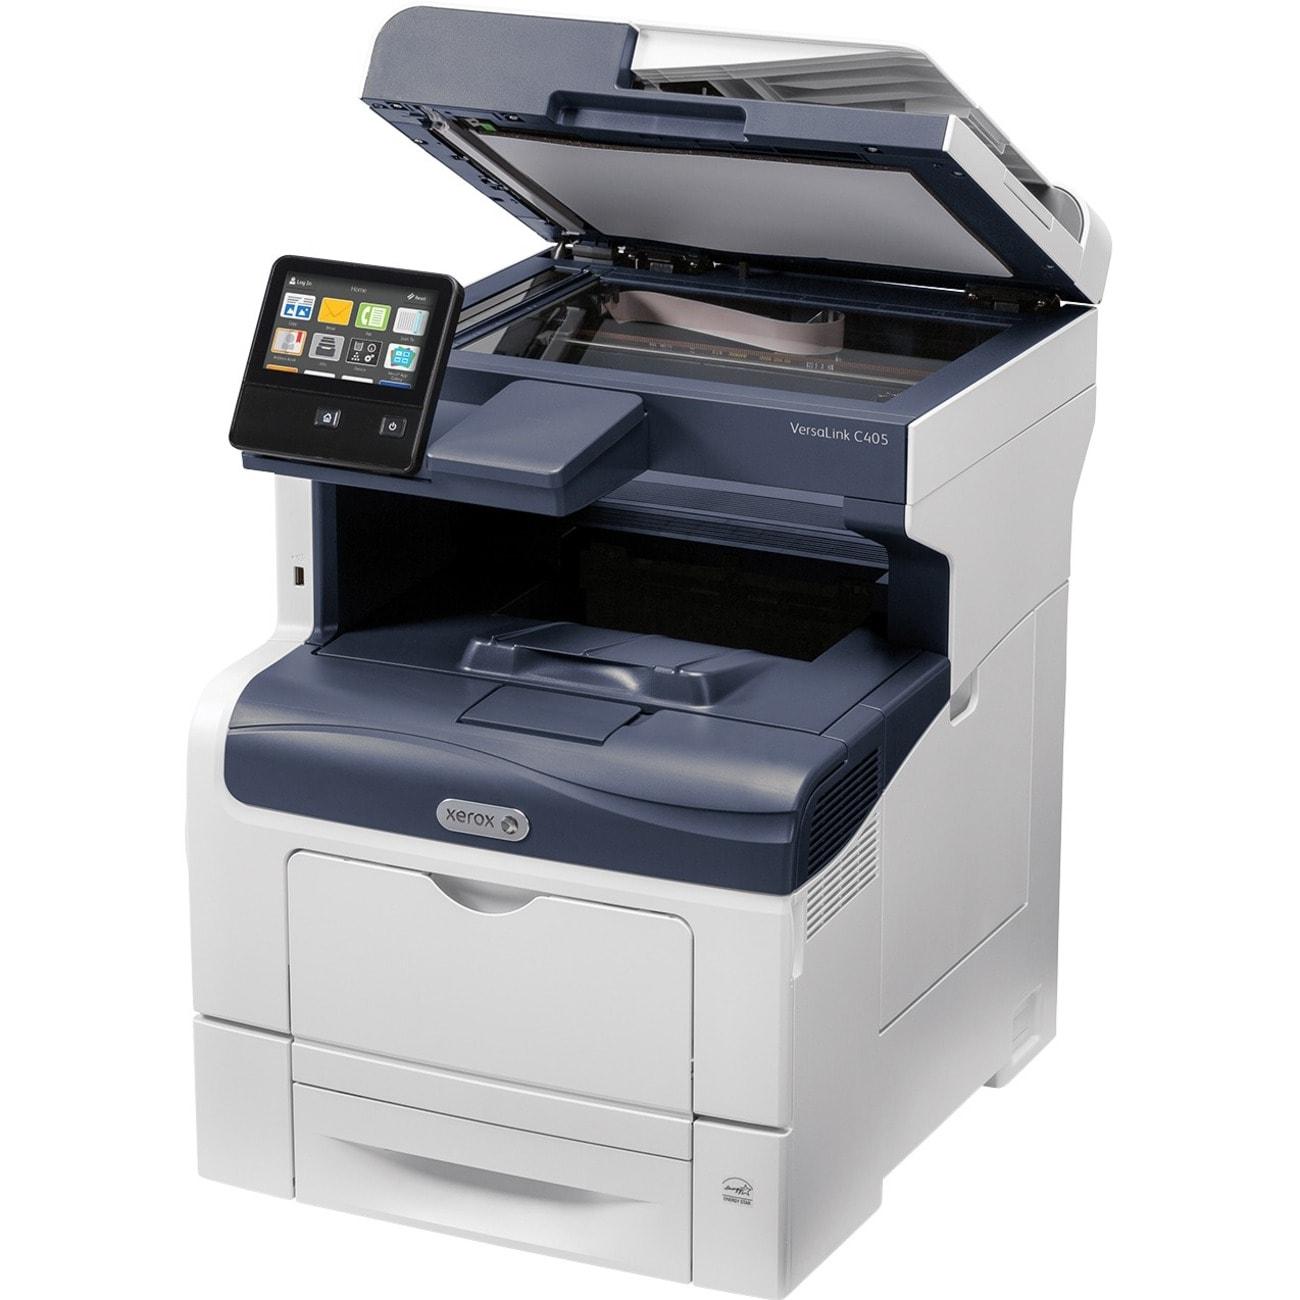 Xerox VersaLink C405/N Laser Multifunction Printer - Colo...